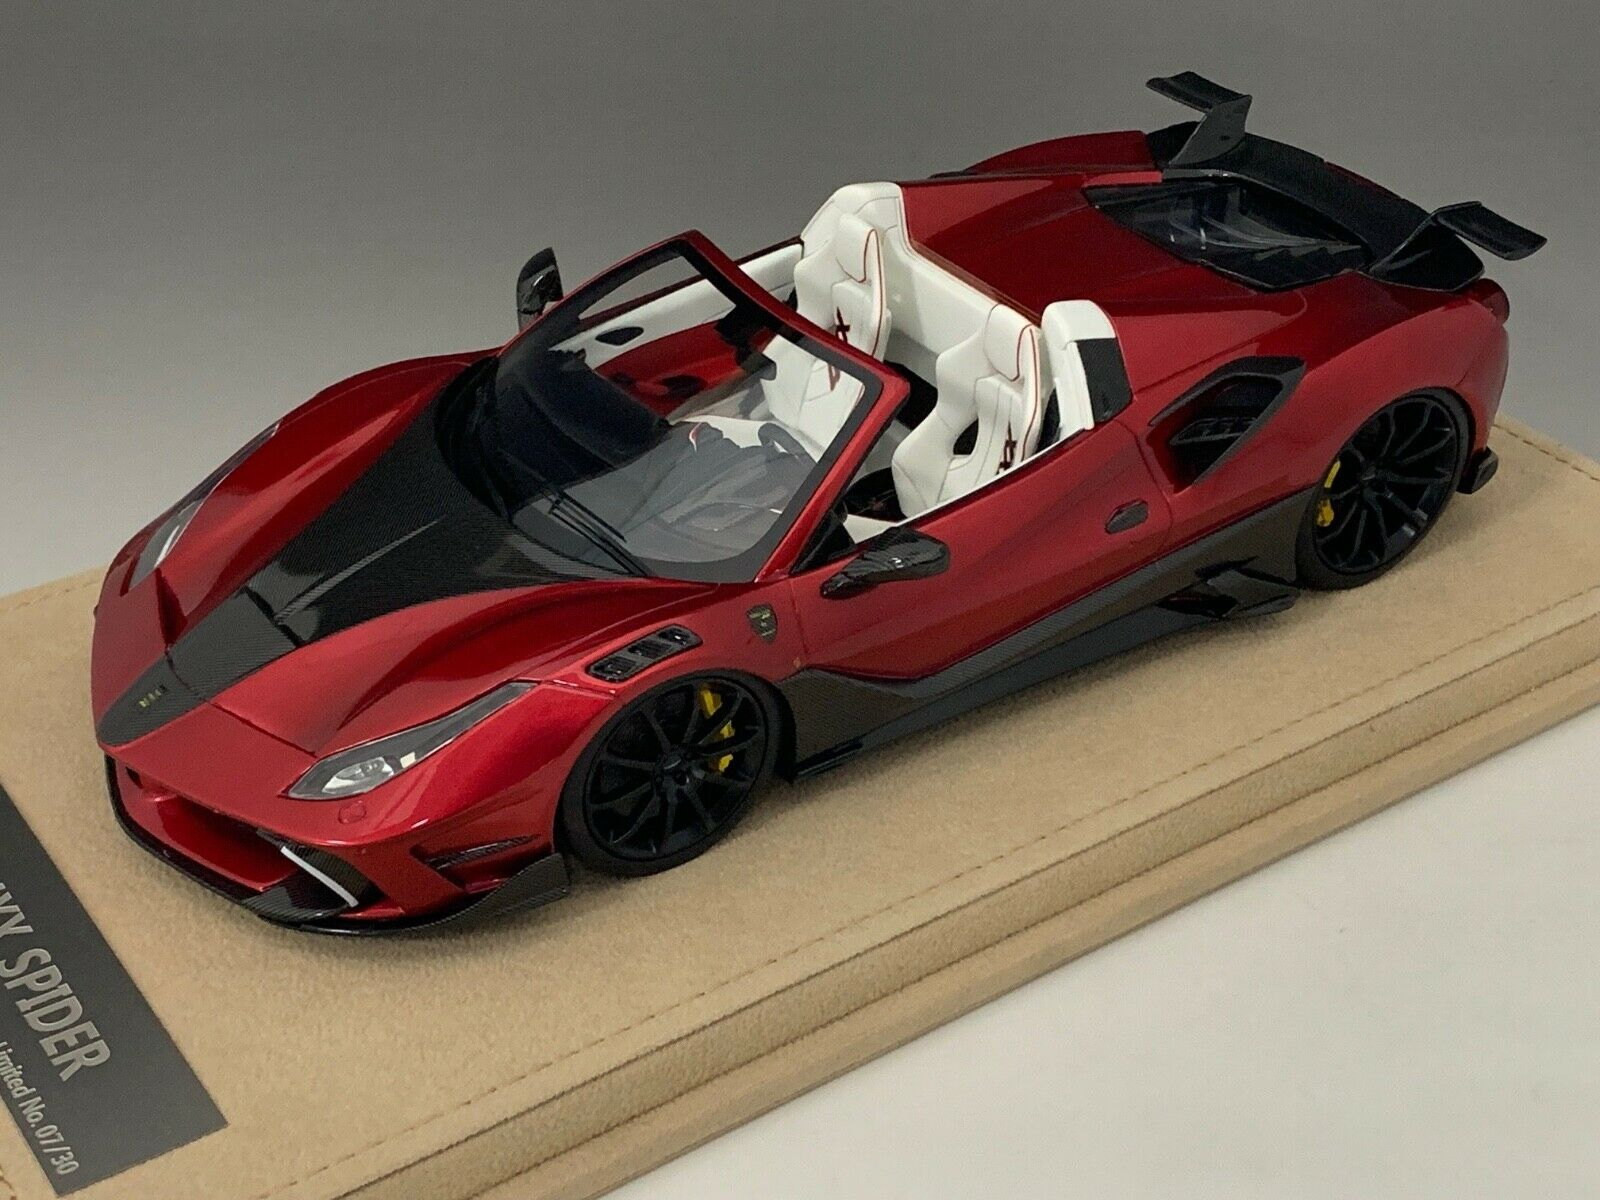 1 18 Ferrari 488 Siracusa 4XX Spider in Metallic Red limited 30 pcs  N BBR or MR